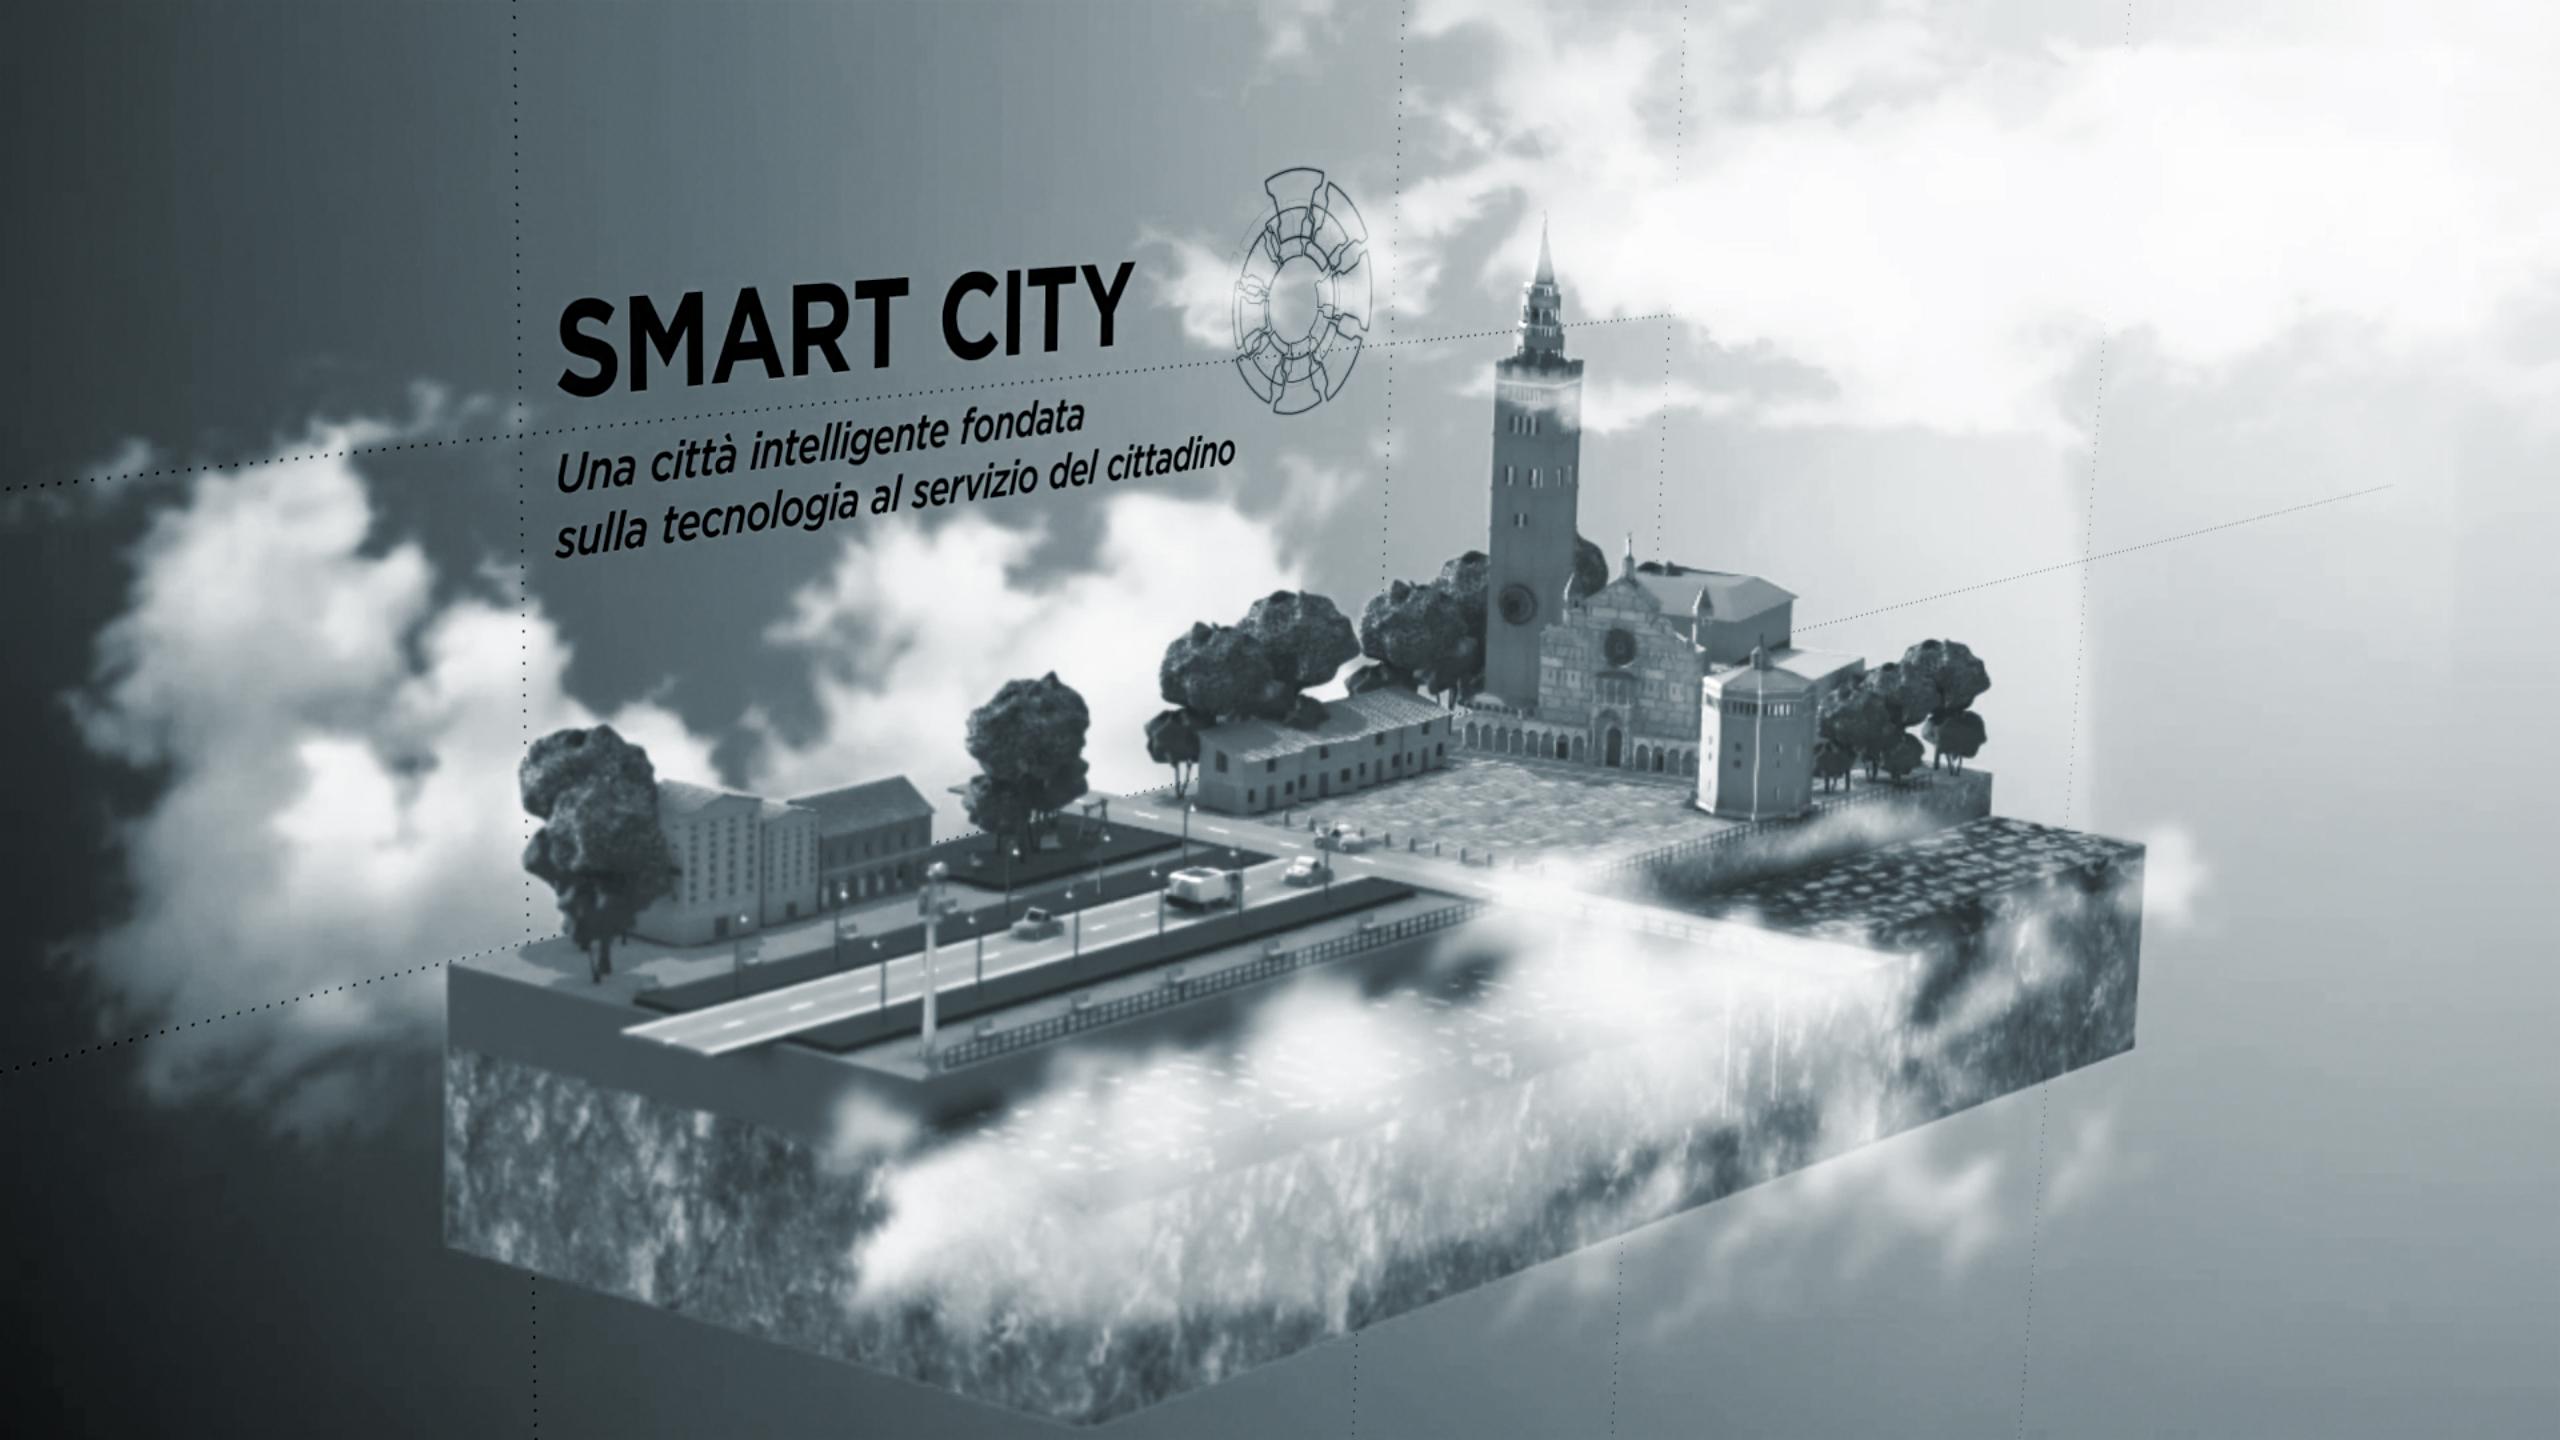 LGH – Smart city